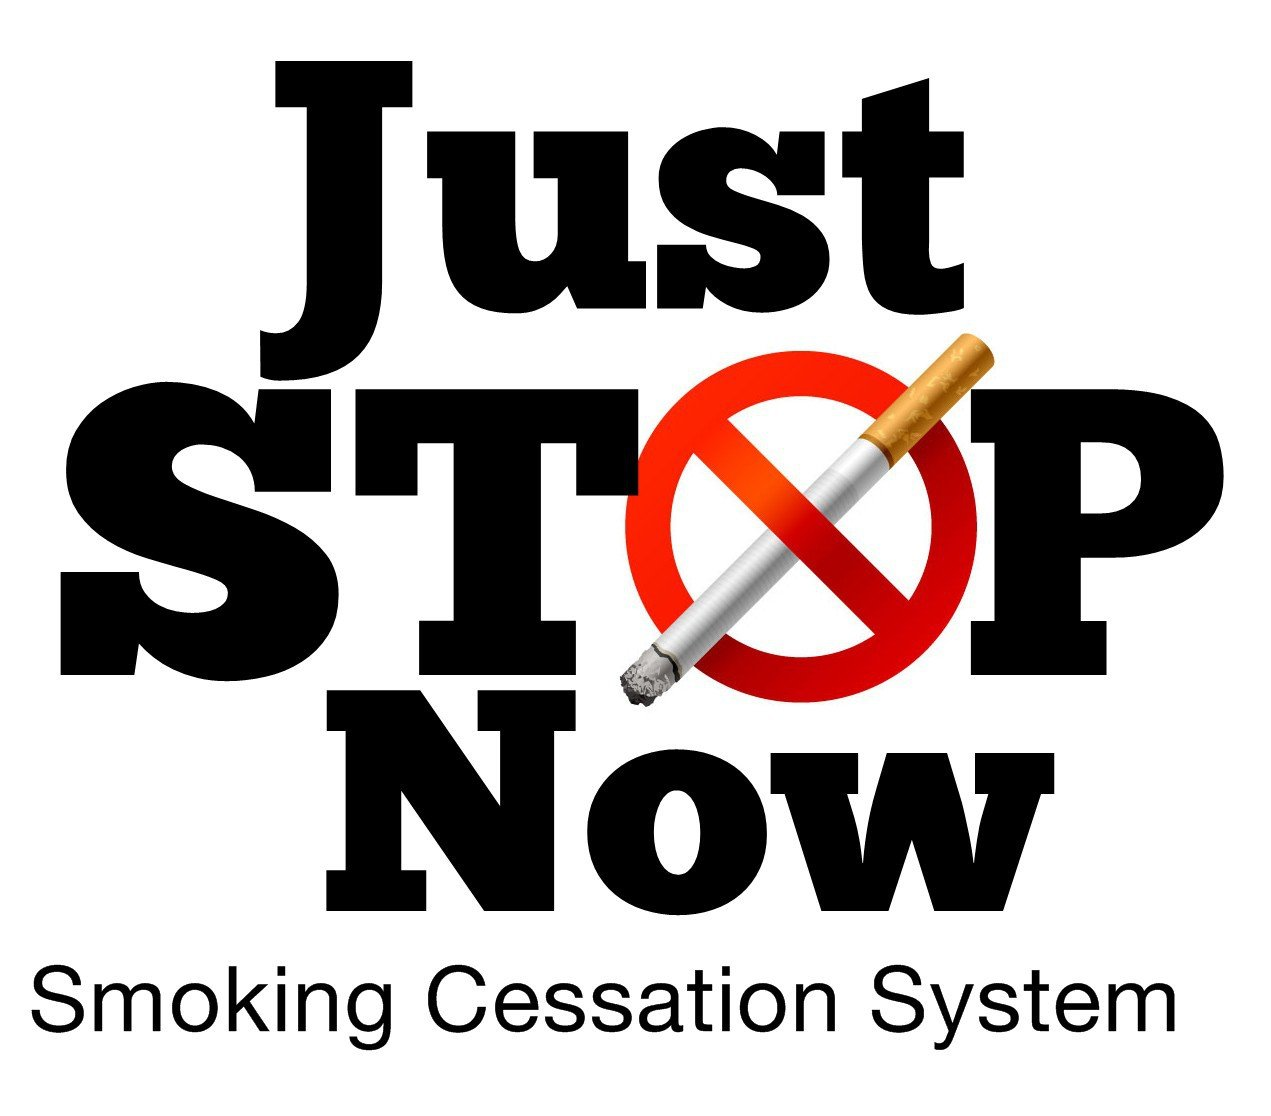 just stop now smoking cessation system venice sullivan